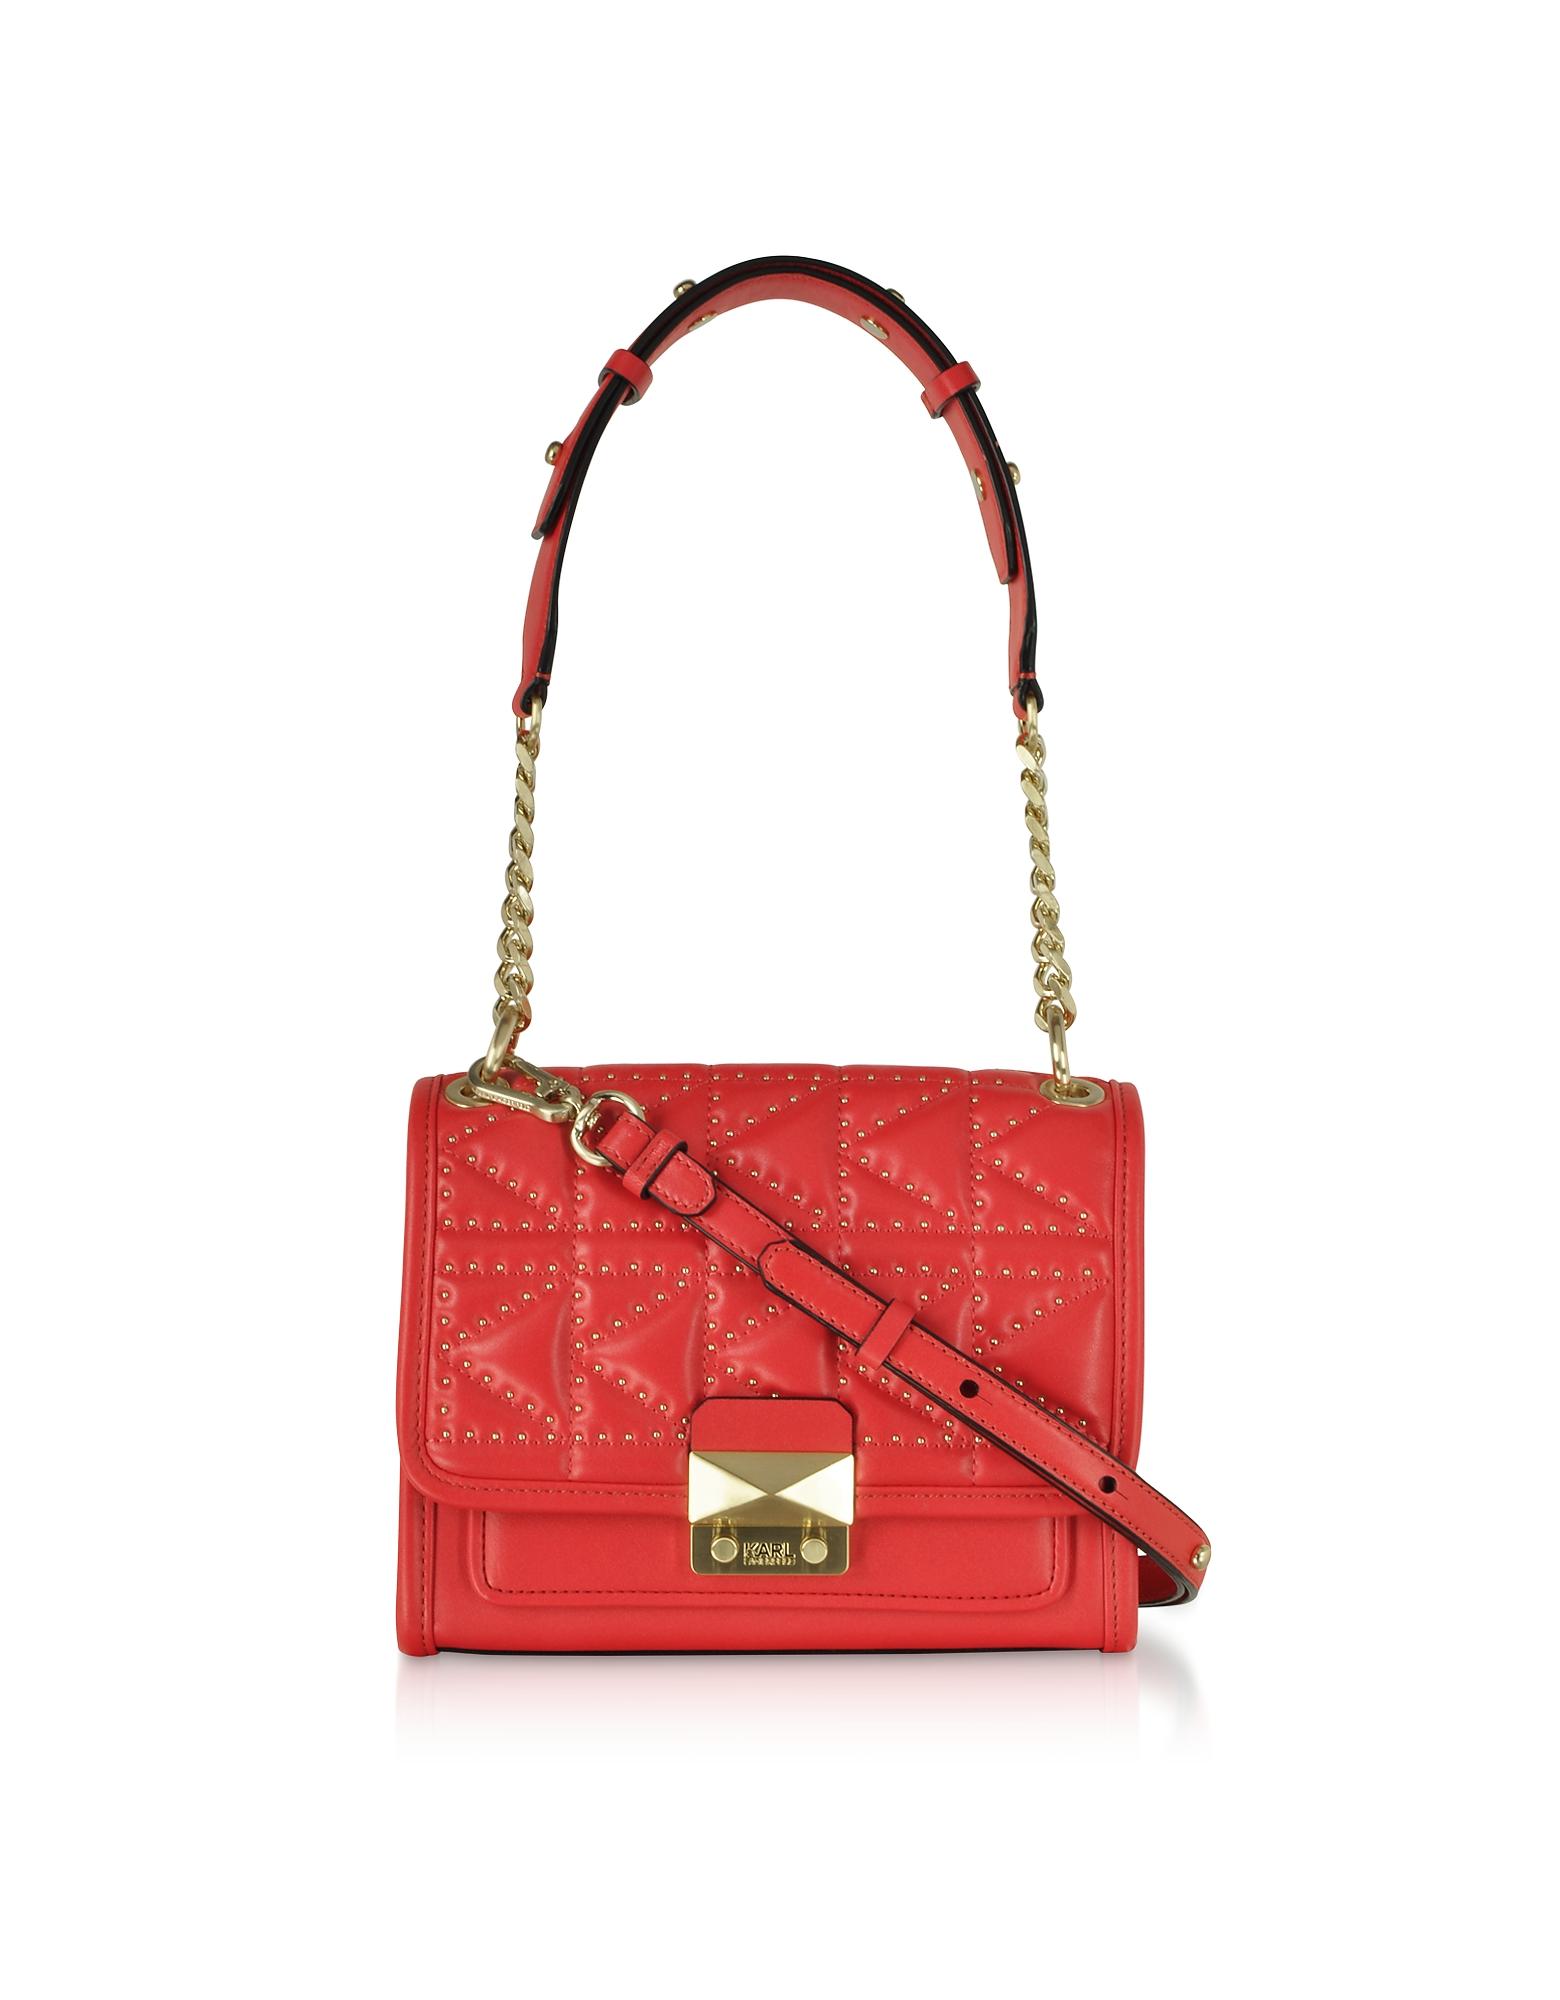 Karl Lagerfeld Designer Handbags, K/Kuilted Studs Small Handbag